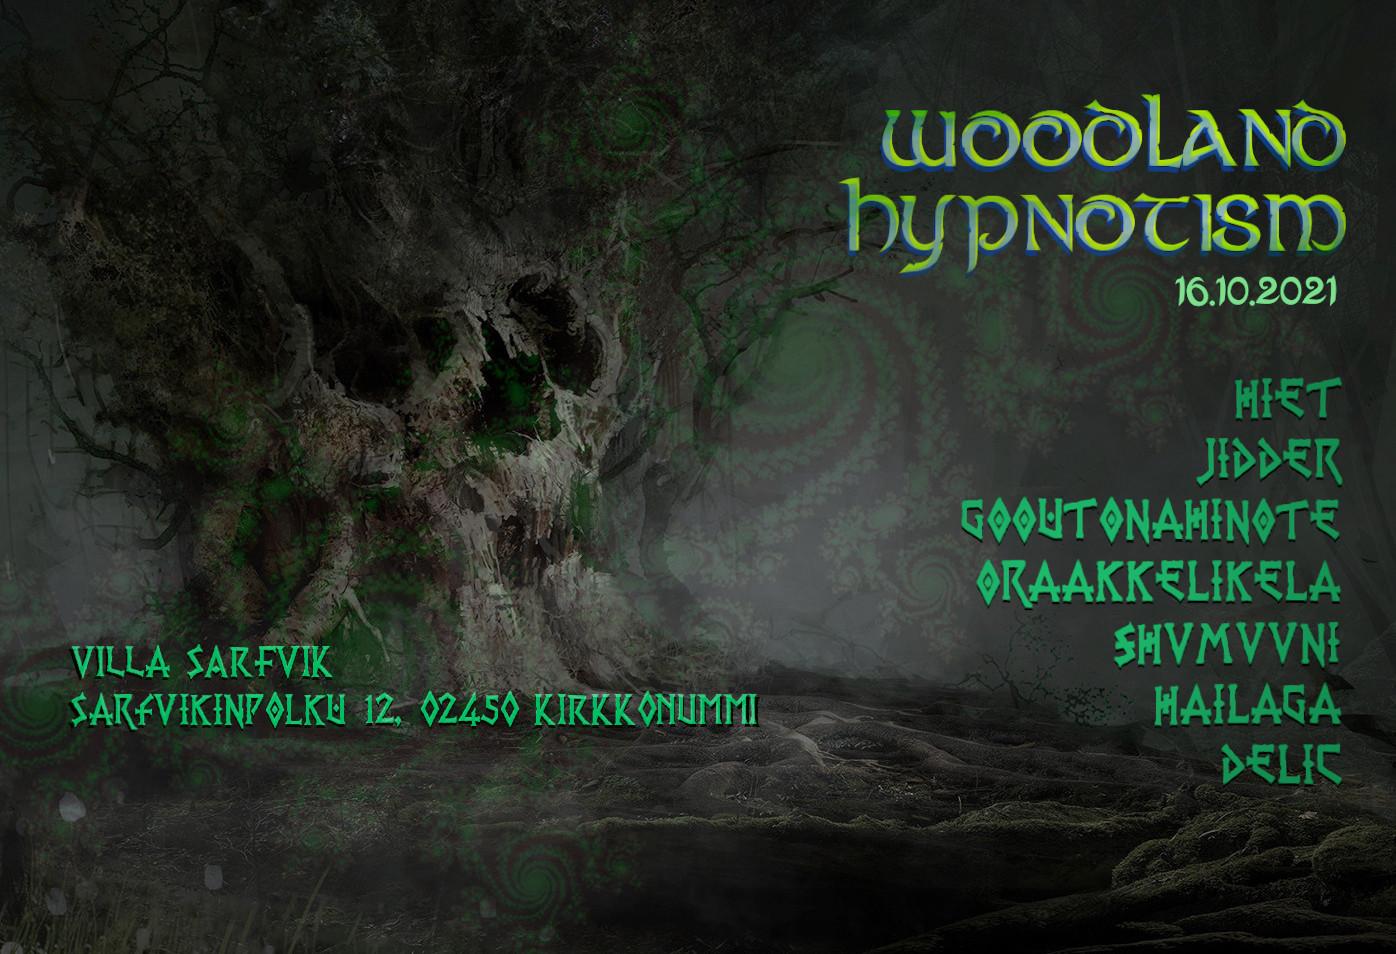 Woodland Hypnotism